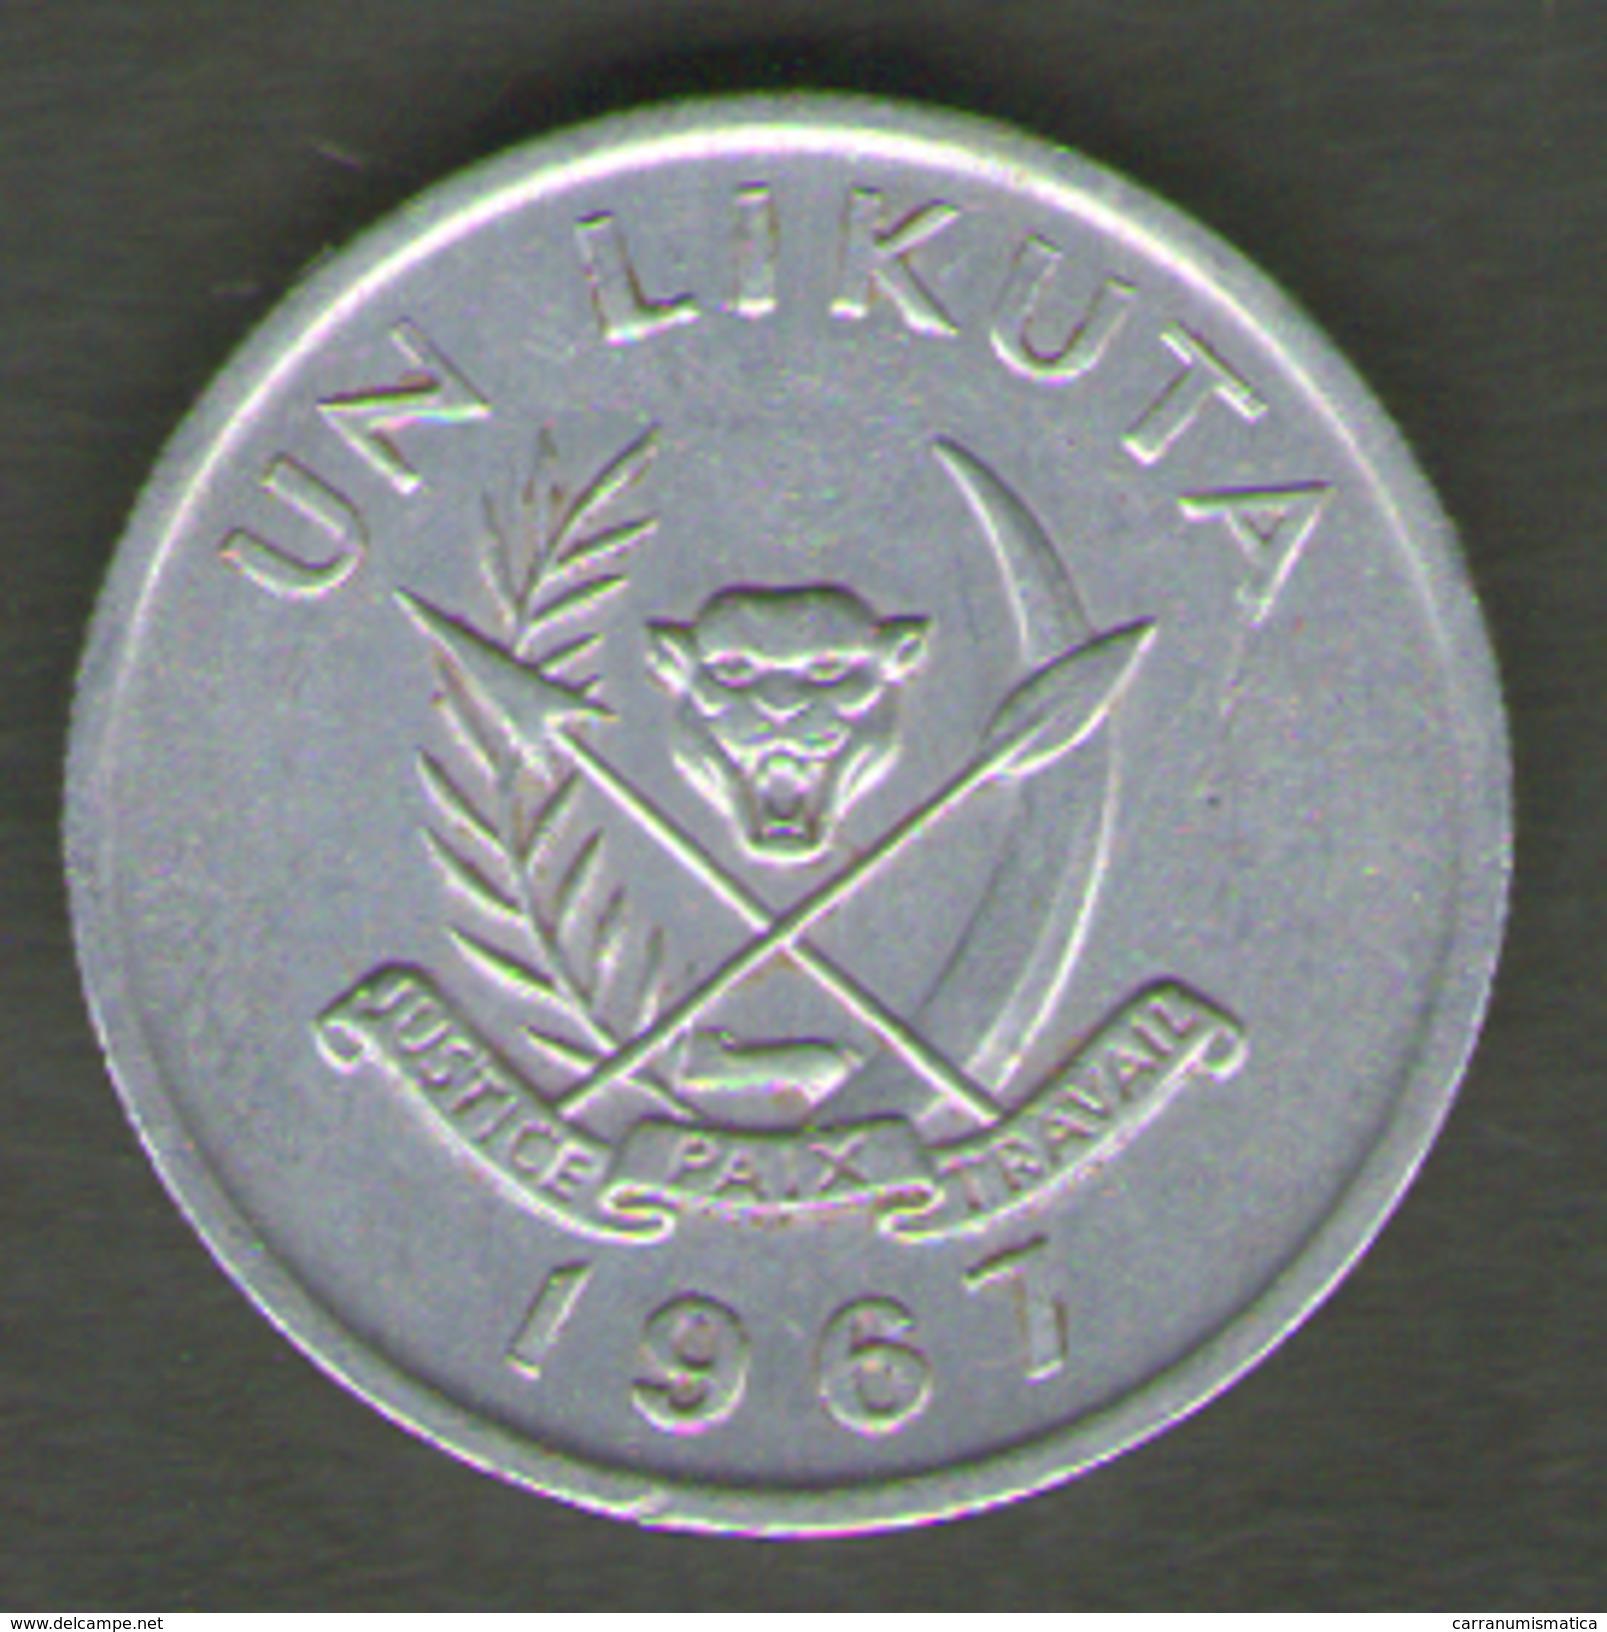 CONGO 1 LIKUTA 1967 - Congo (Republic 1960)